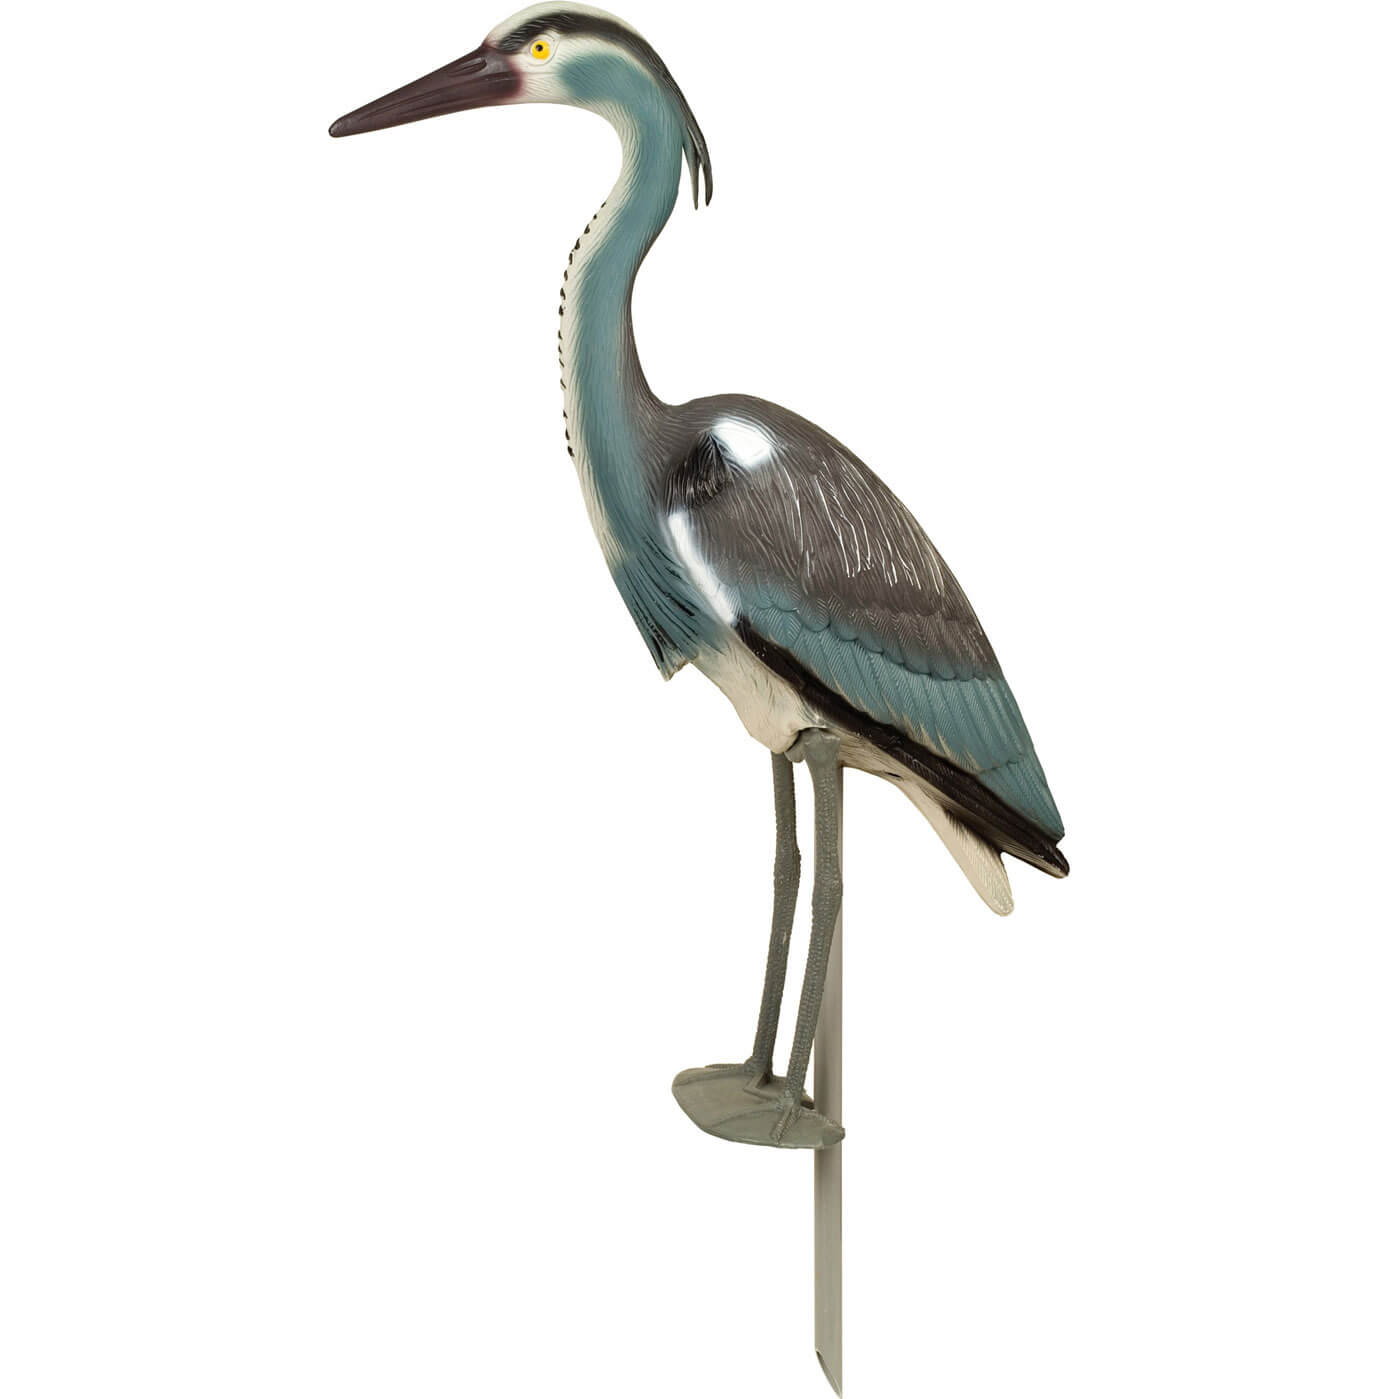 Heron garden ornament - Stv Heron Garden Ornament Bird Deterant